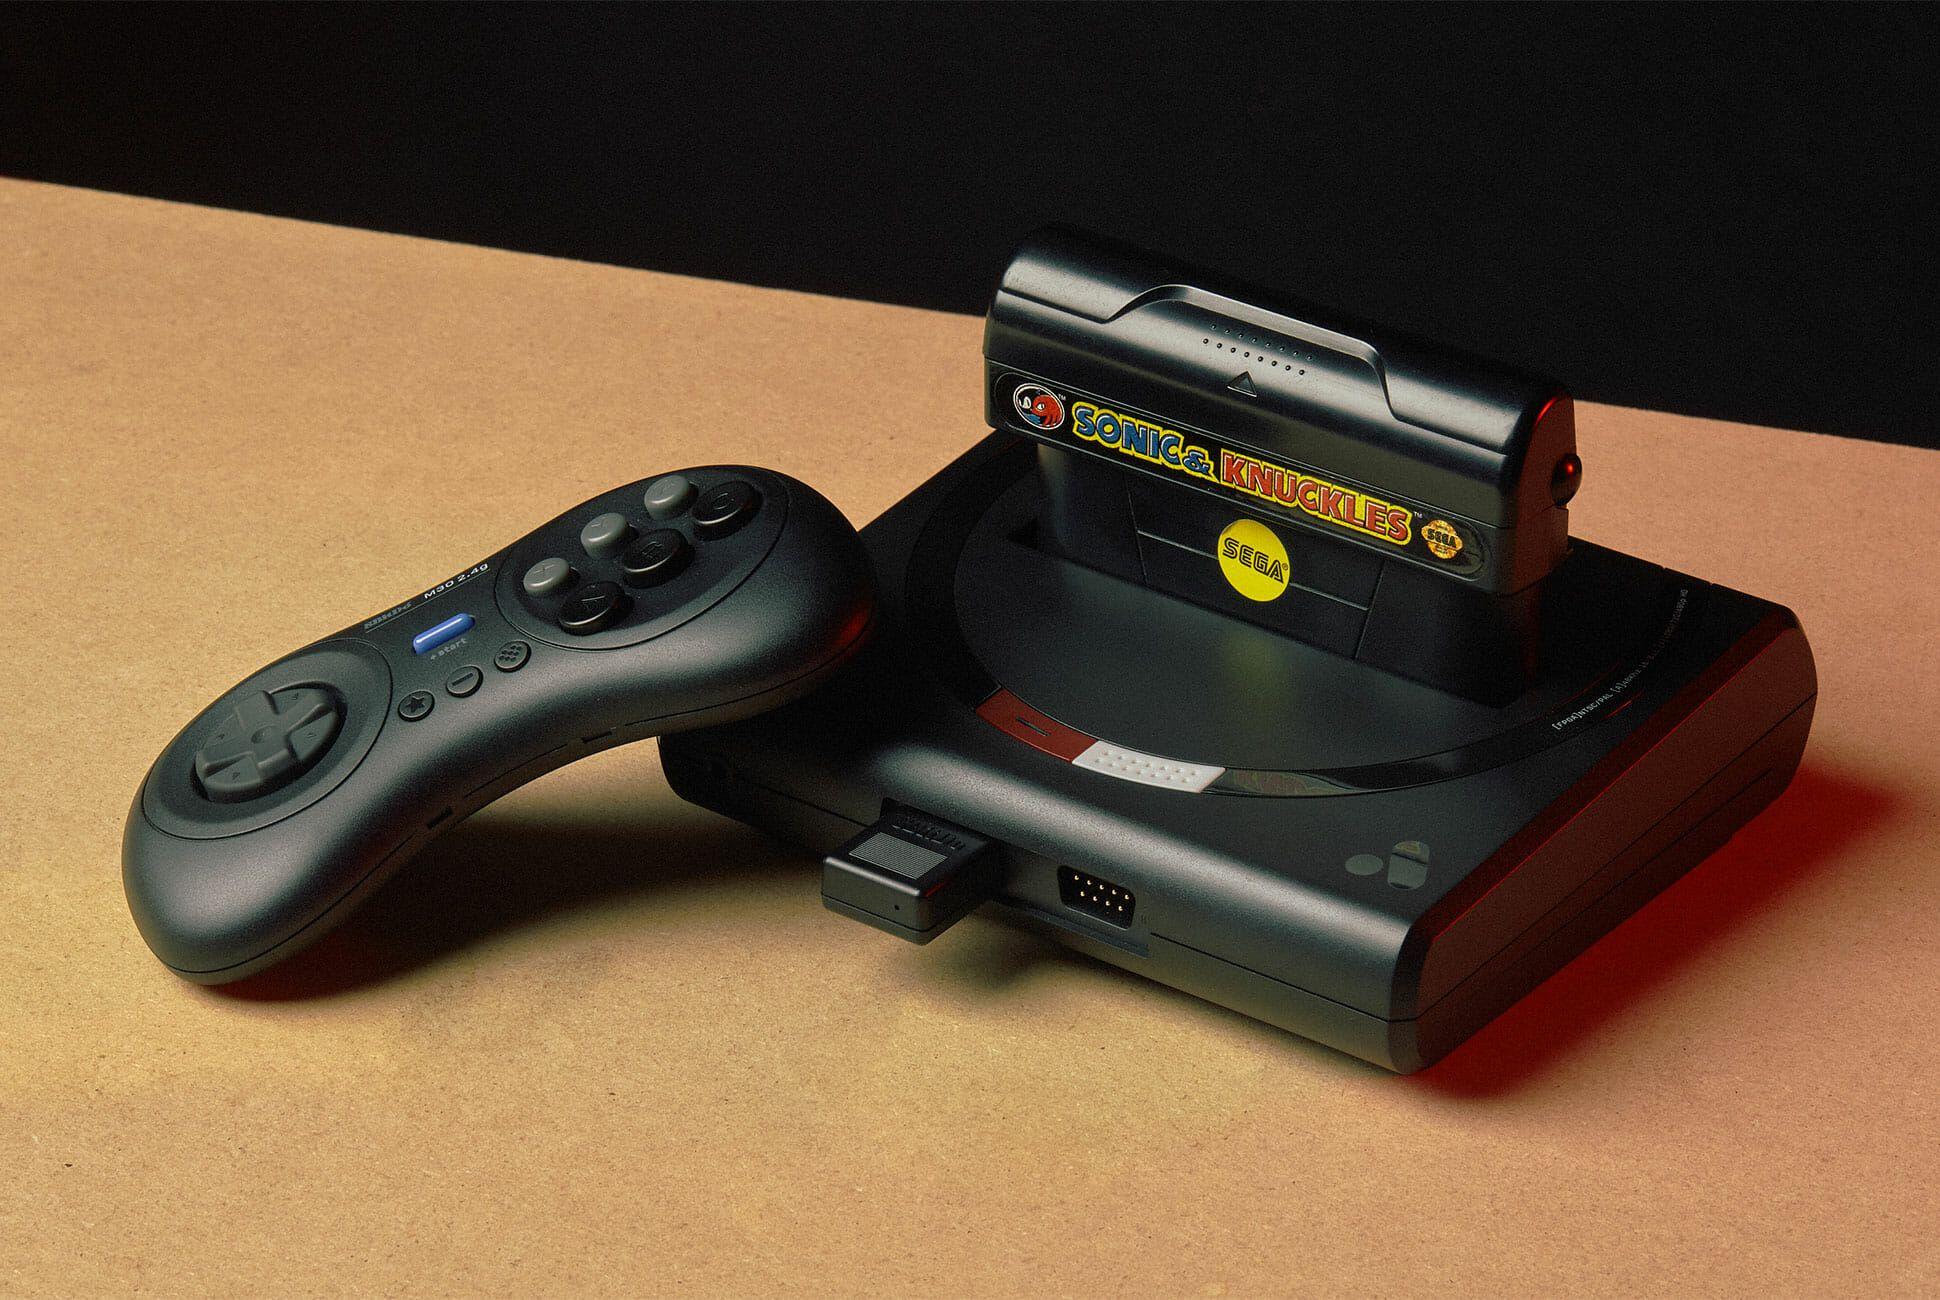 The-Ultimate-Sega-Genesis-Console-for-Your-Modern-TV-Gear-Patrol-slide-1